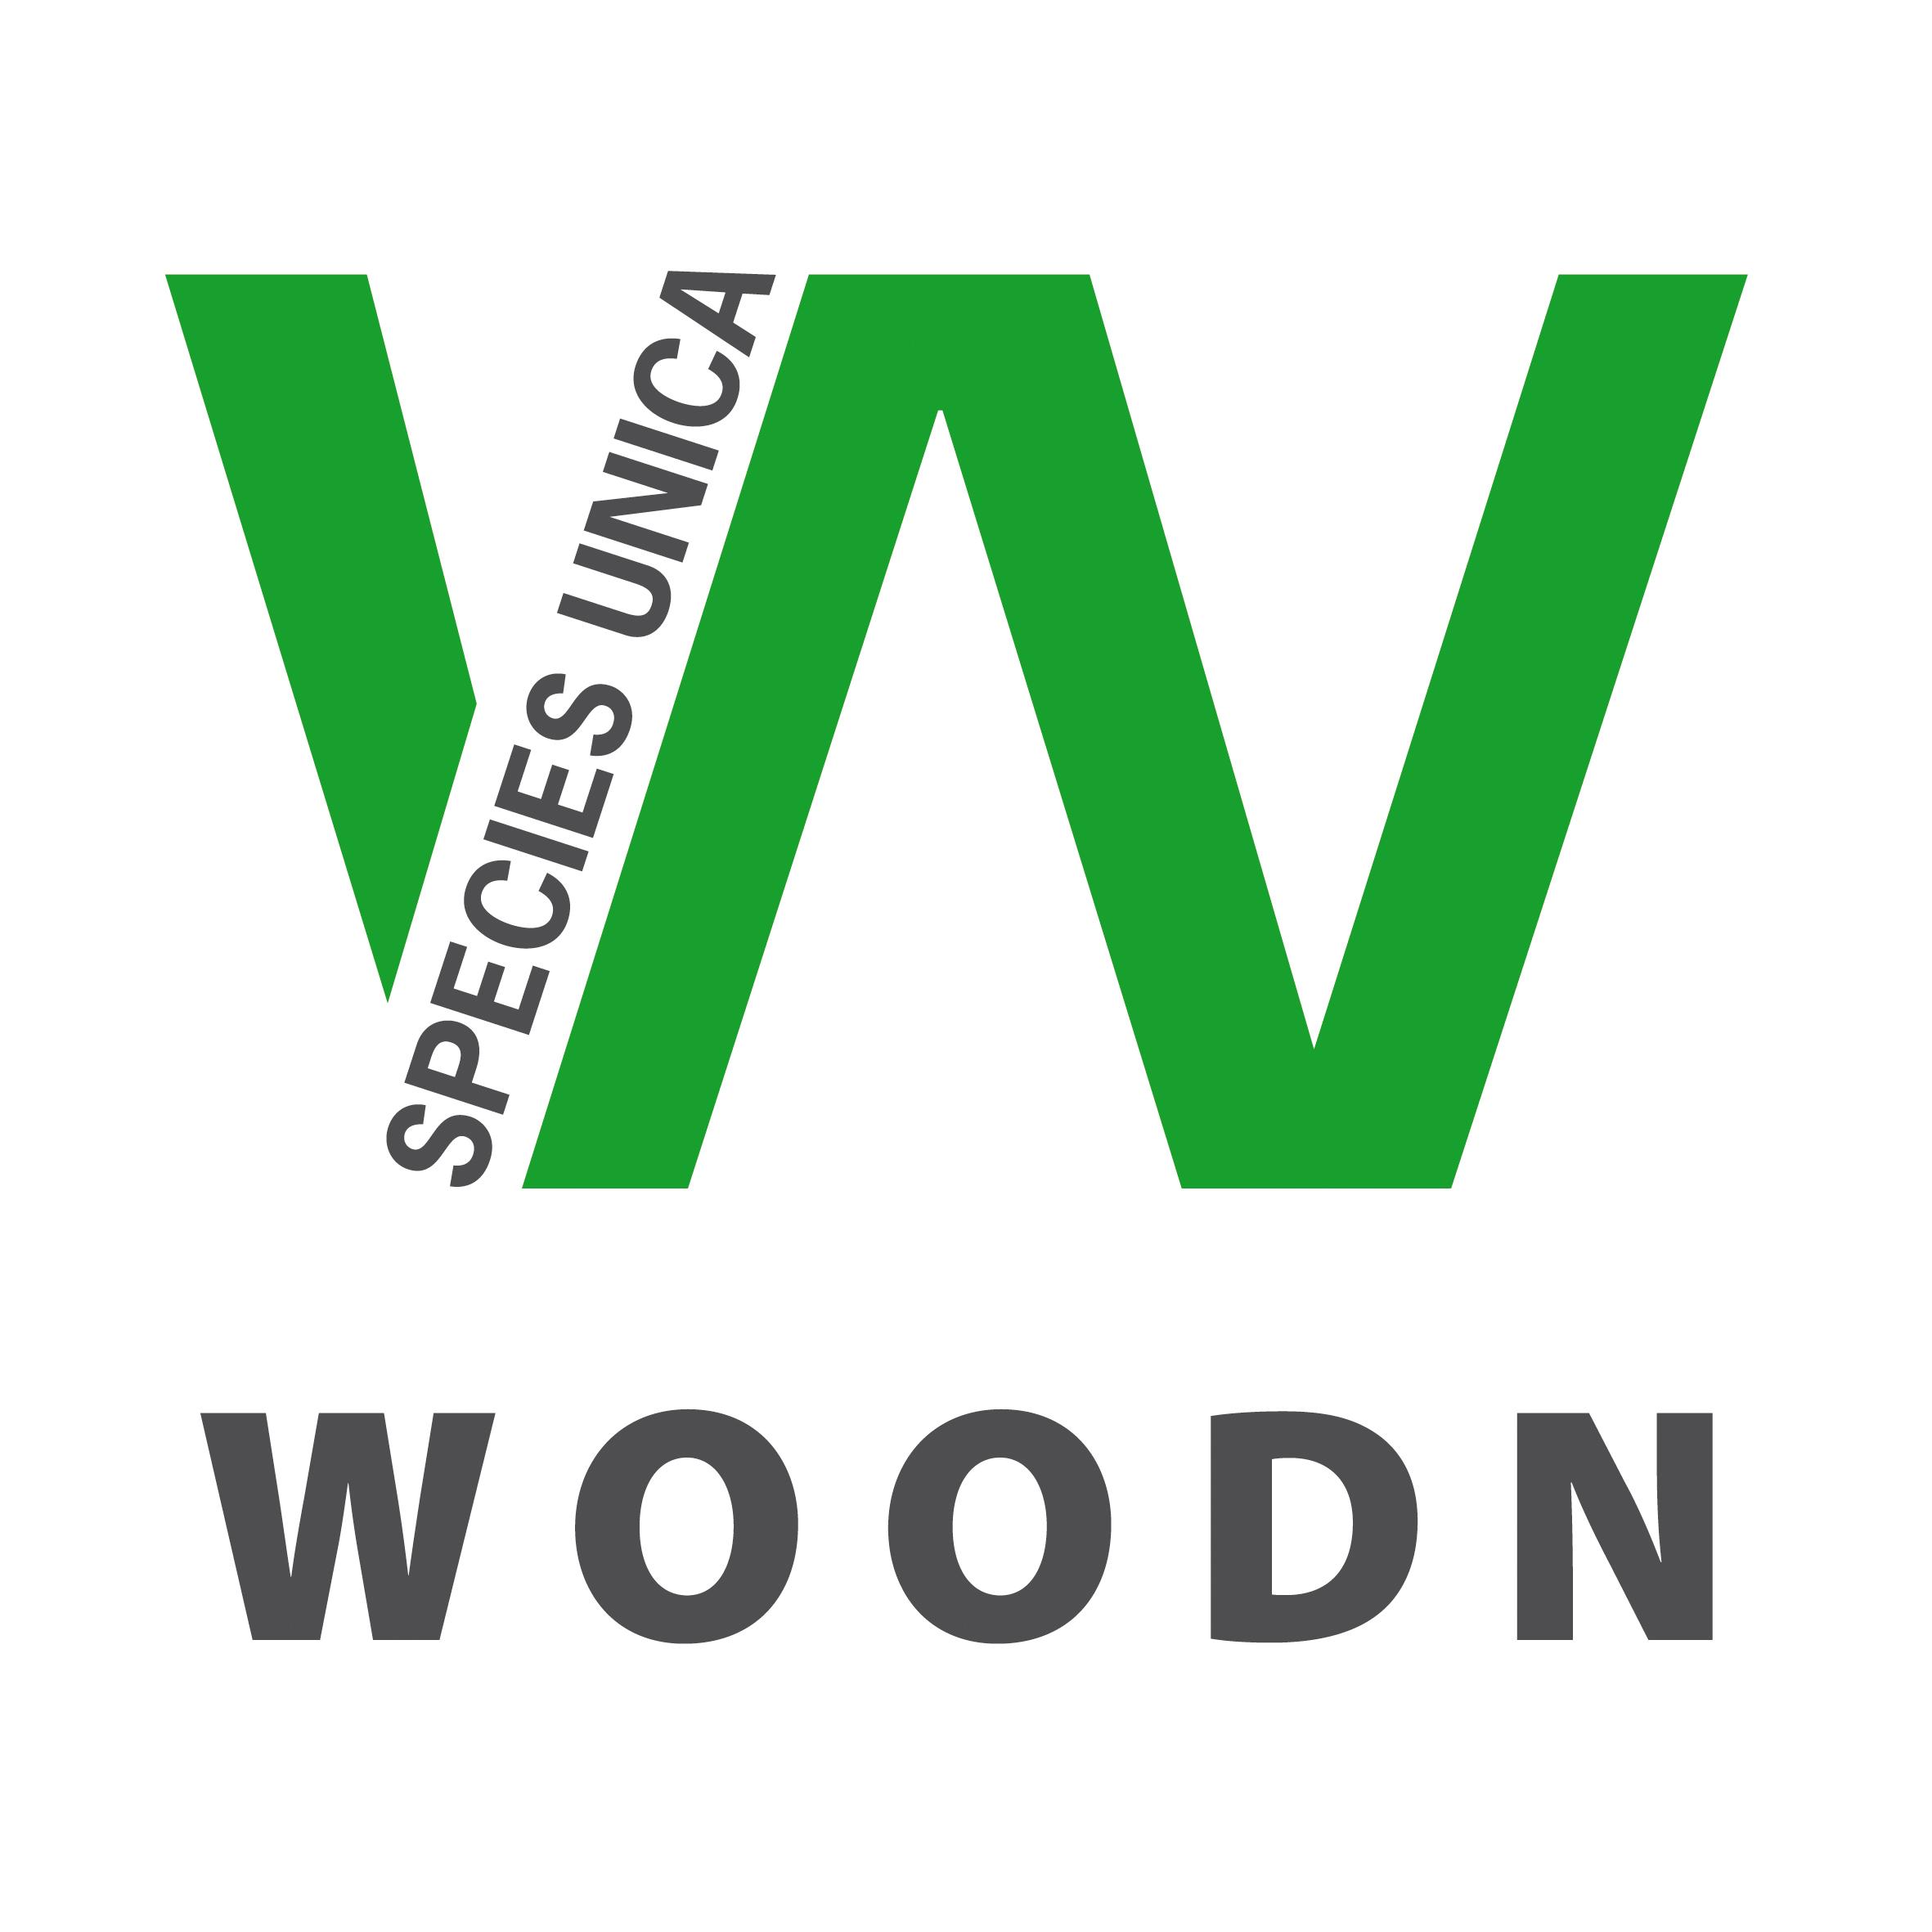 LOGO WOODN 1832016